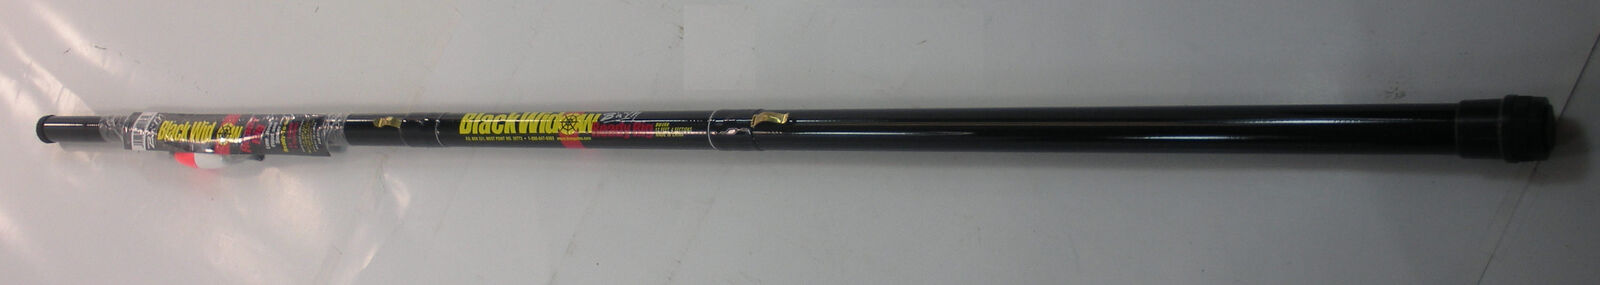 B & M BW4RR 4m Vedova Nera Rig Pronti tutti'Uso Asta 4 Sezioni 13981